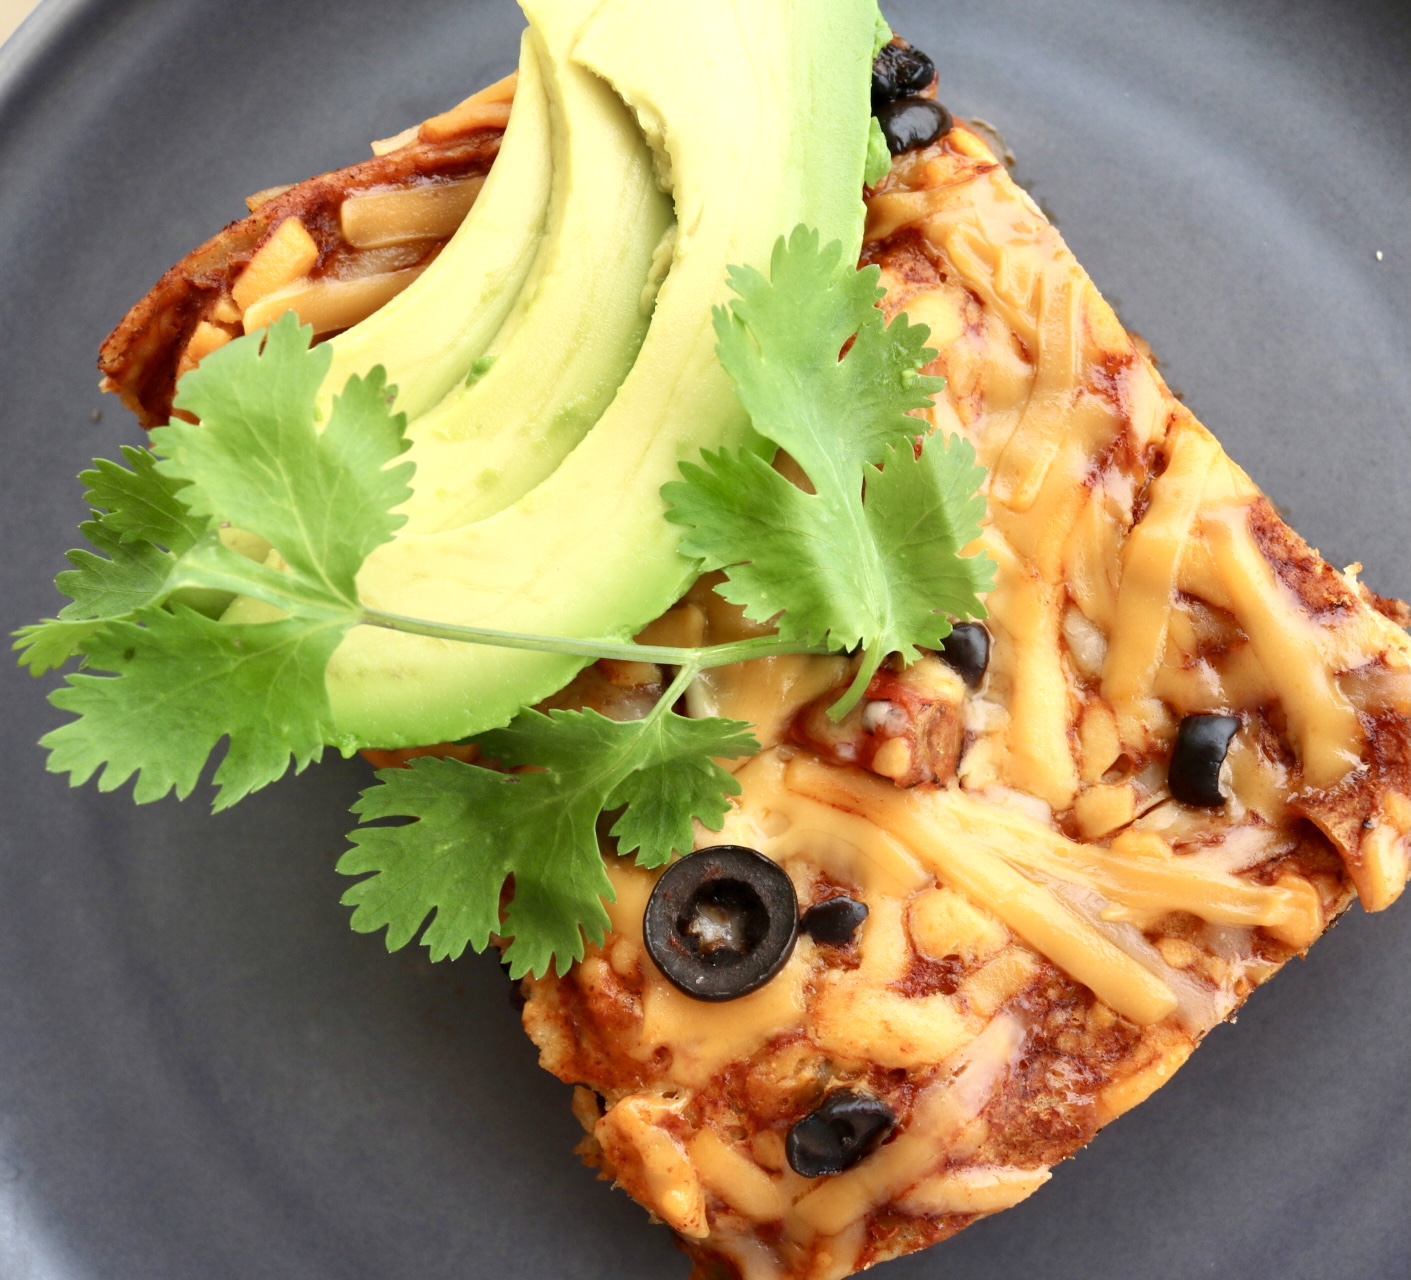 Vegan Enchilada Casserole Gluten-Free by Vegan Anj Featured